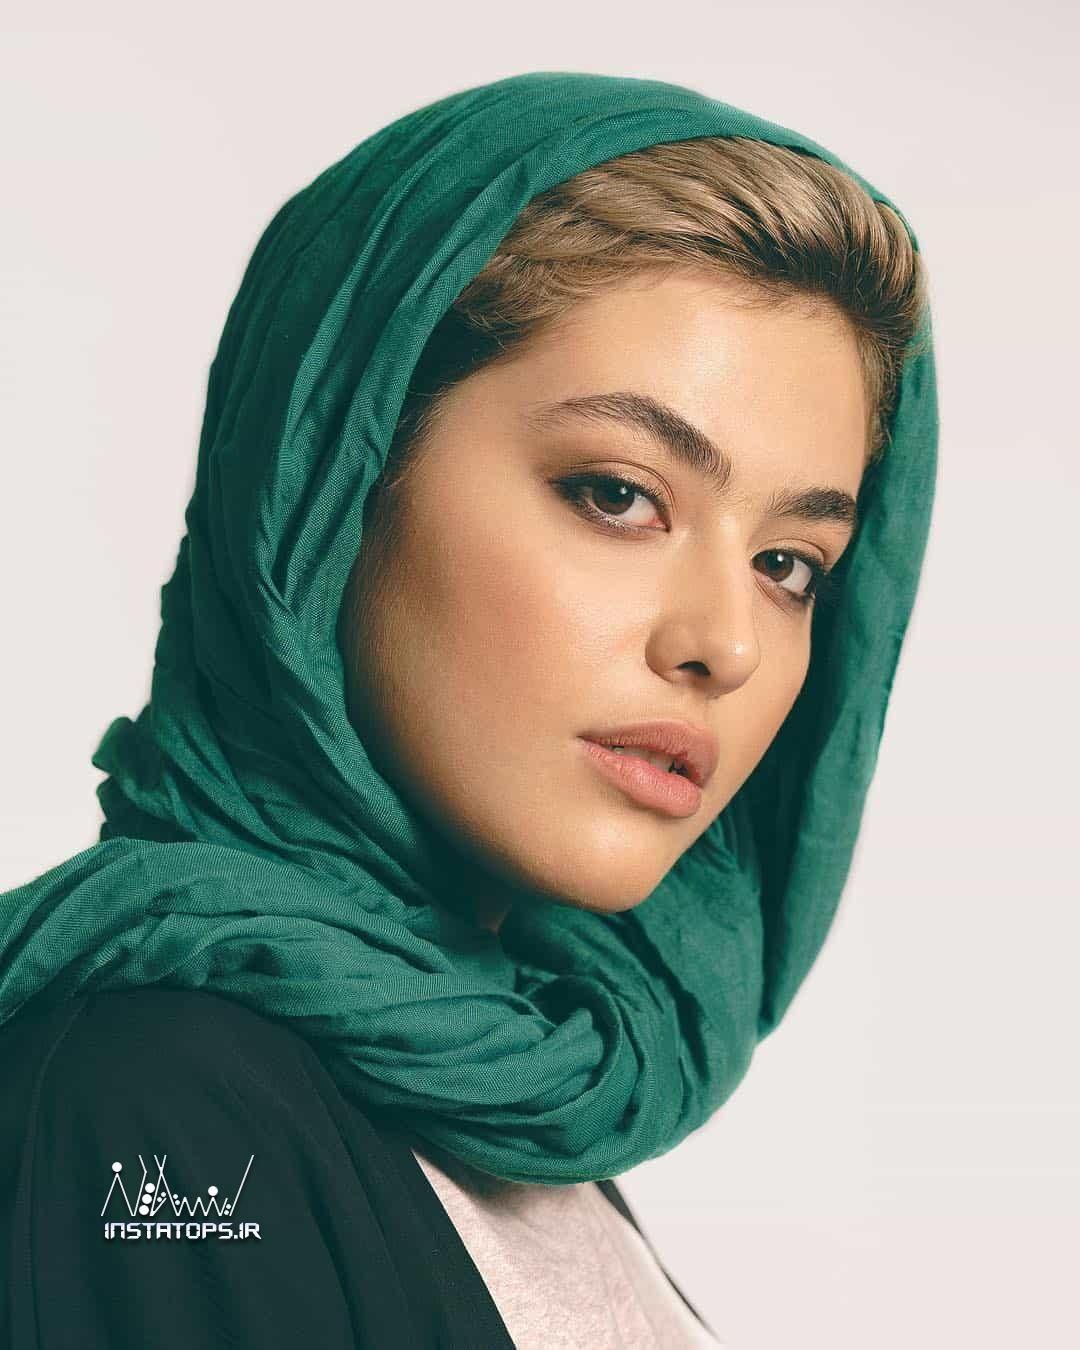 ريحانه پارسا Reyhane Parsa Persian Women Iranian Women Fashion Persian Girls